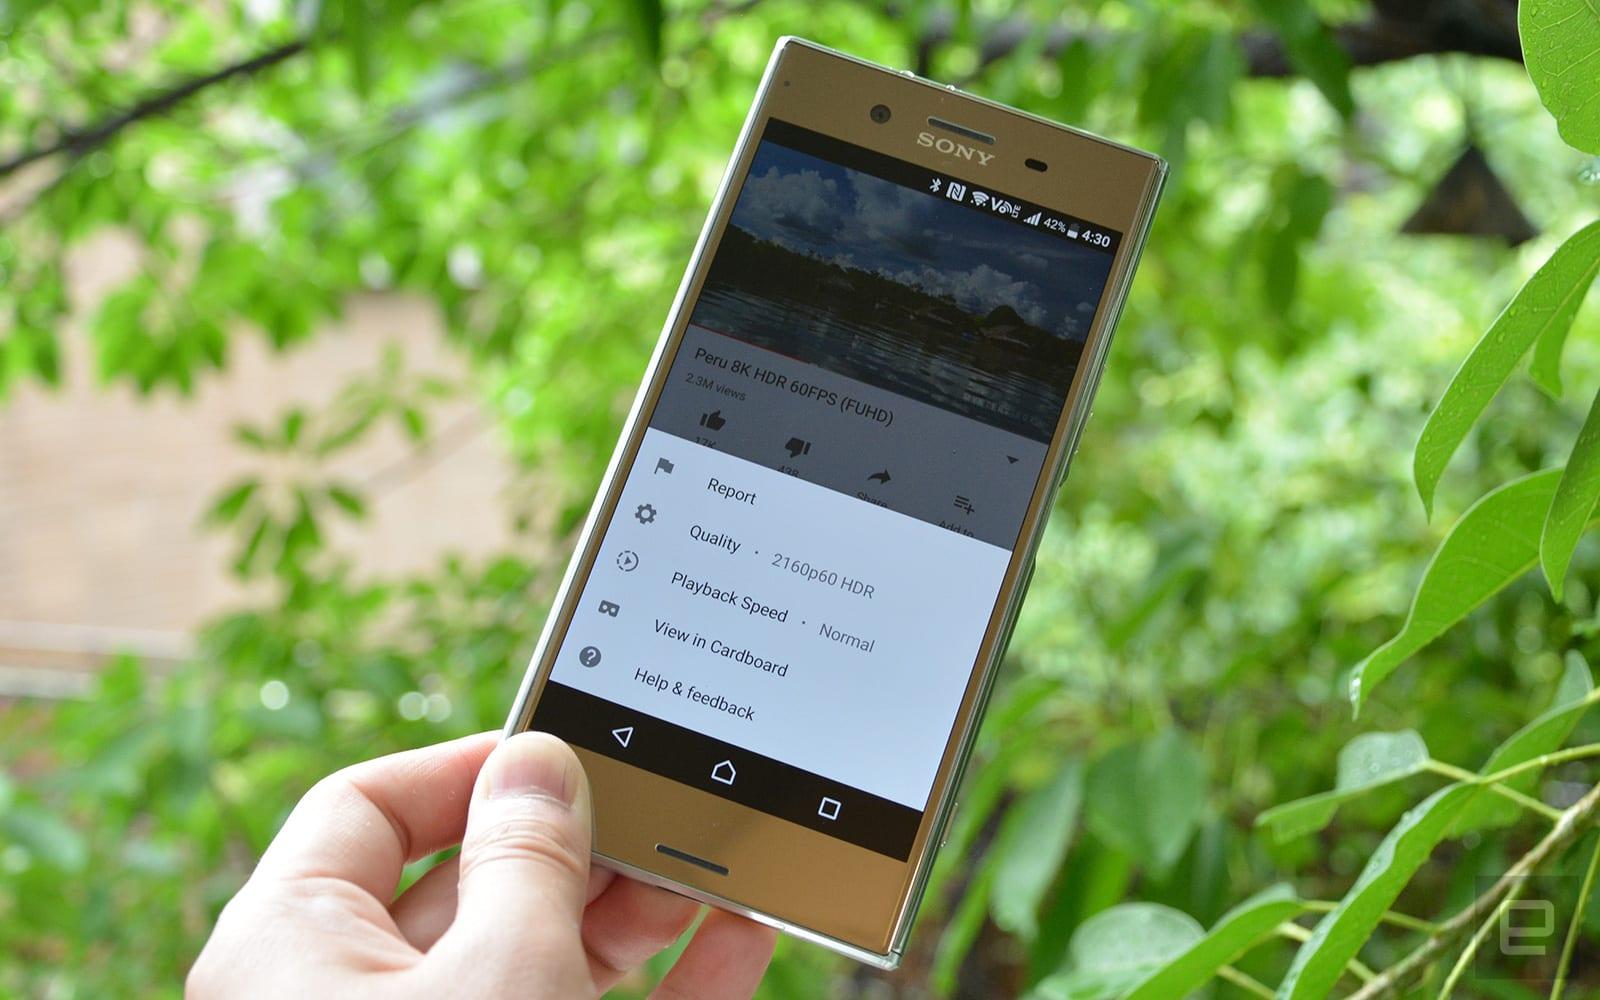 3e76b4e9e YouTube brings playback speed choices to mobile